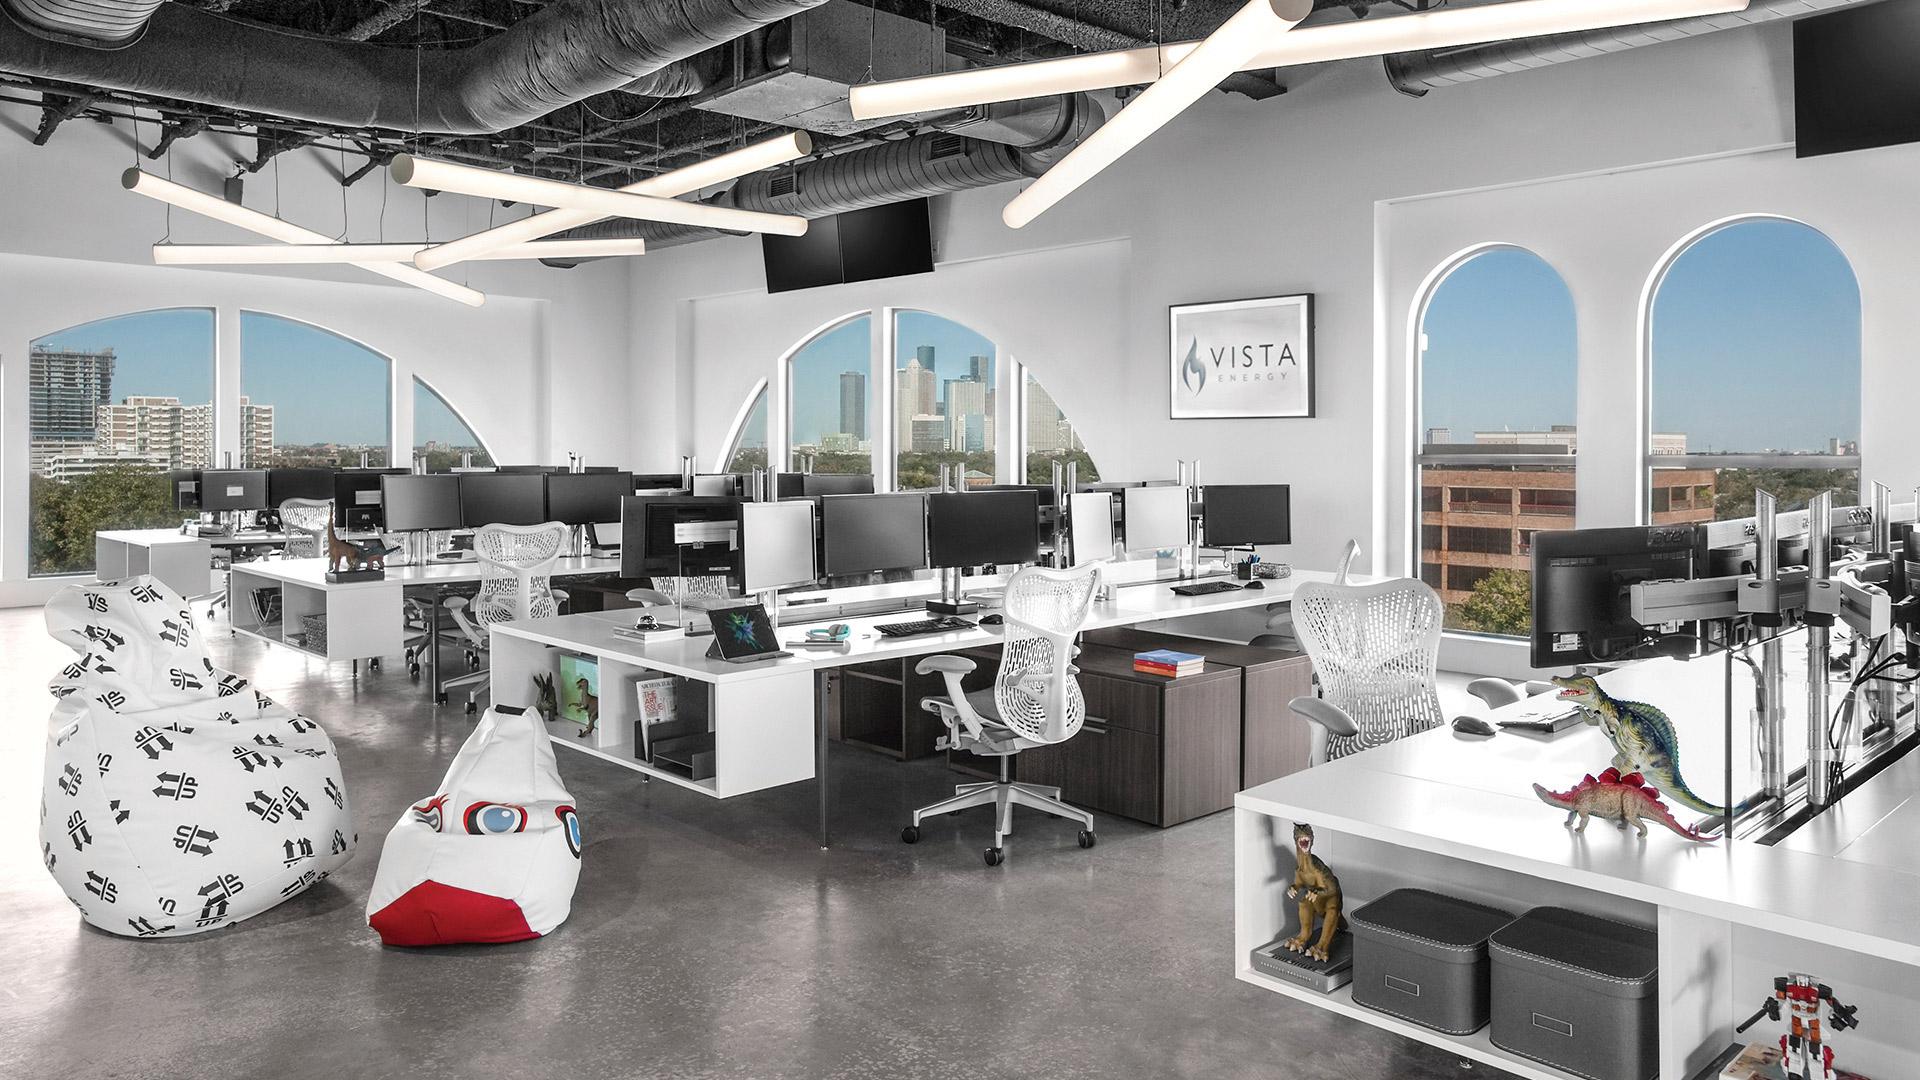 Corporate Interior Design Open Workstations Penthouse View Beanbags Vista Energy